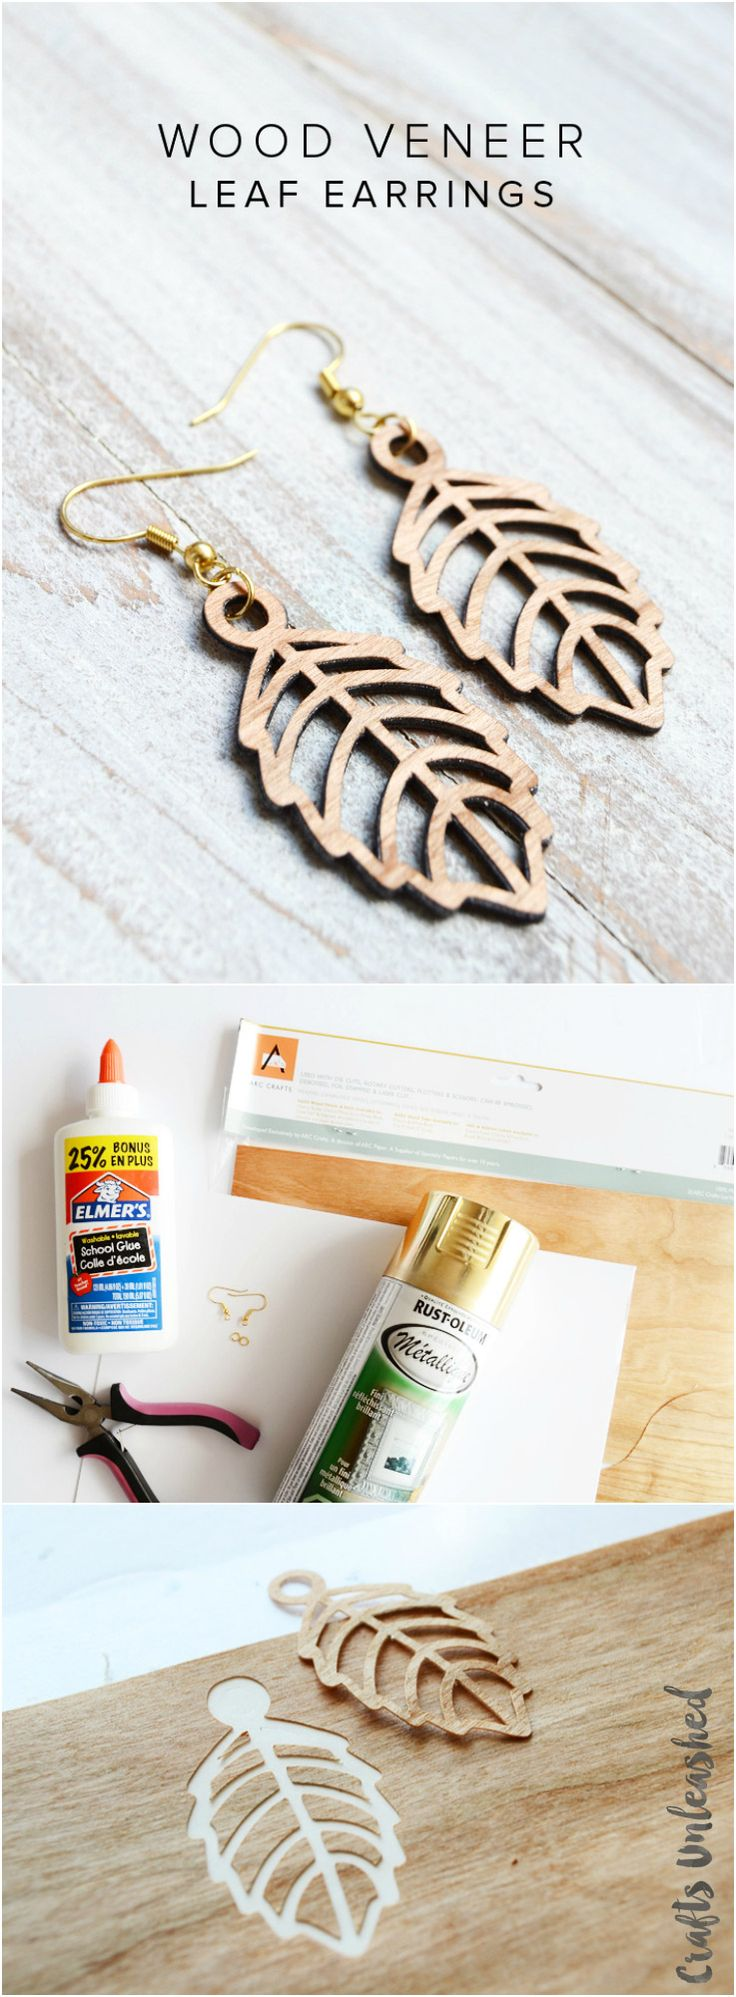 DIY Leaf Earrings Tutorial: Faux Laser Cut Wood - Consumer Crafts                                                                                                                                                                                 More